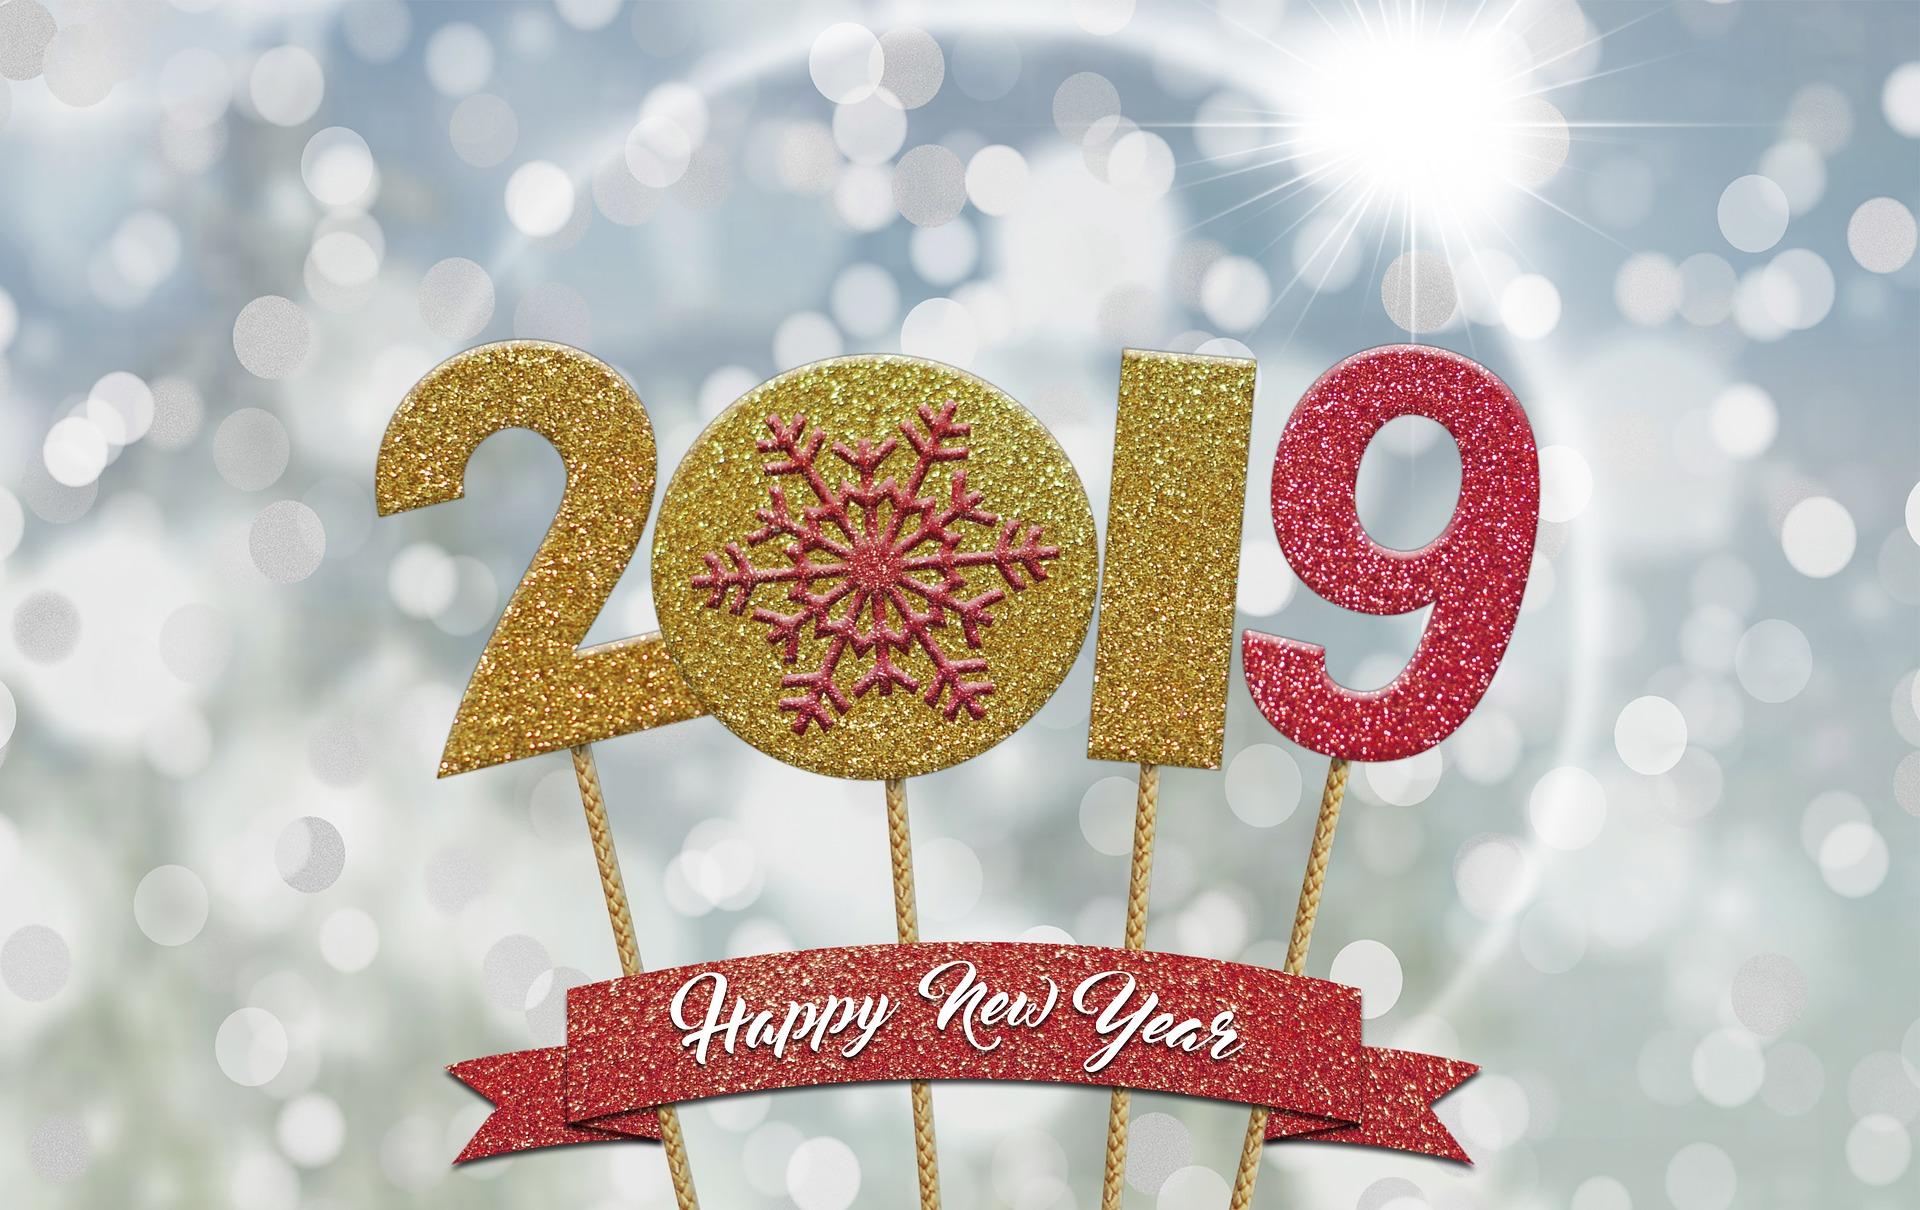 Happy New Year - 2019.jpg